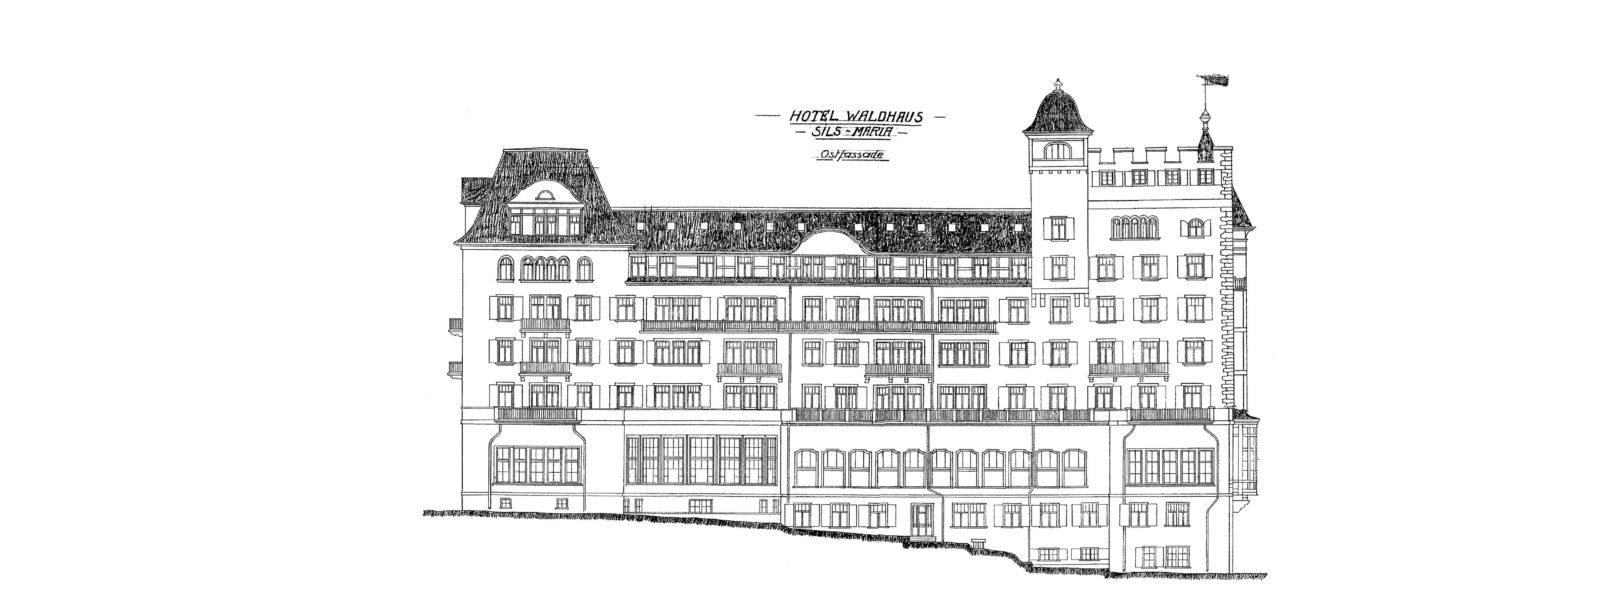 Sketch of the facade - Hotel Waldhaus Sils